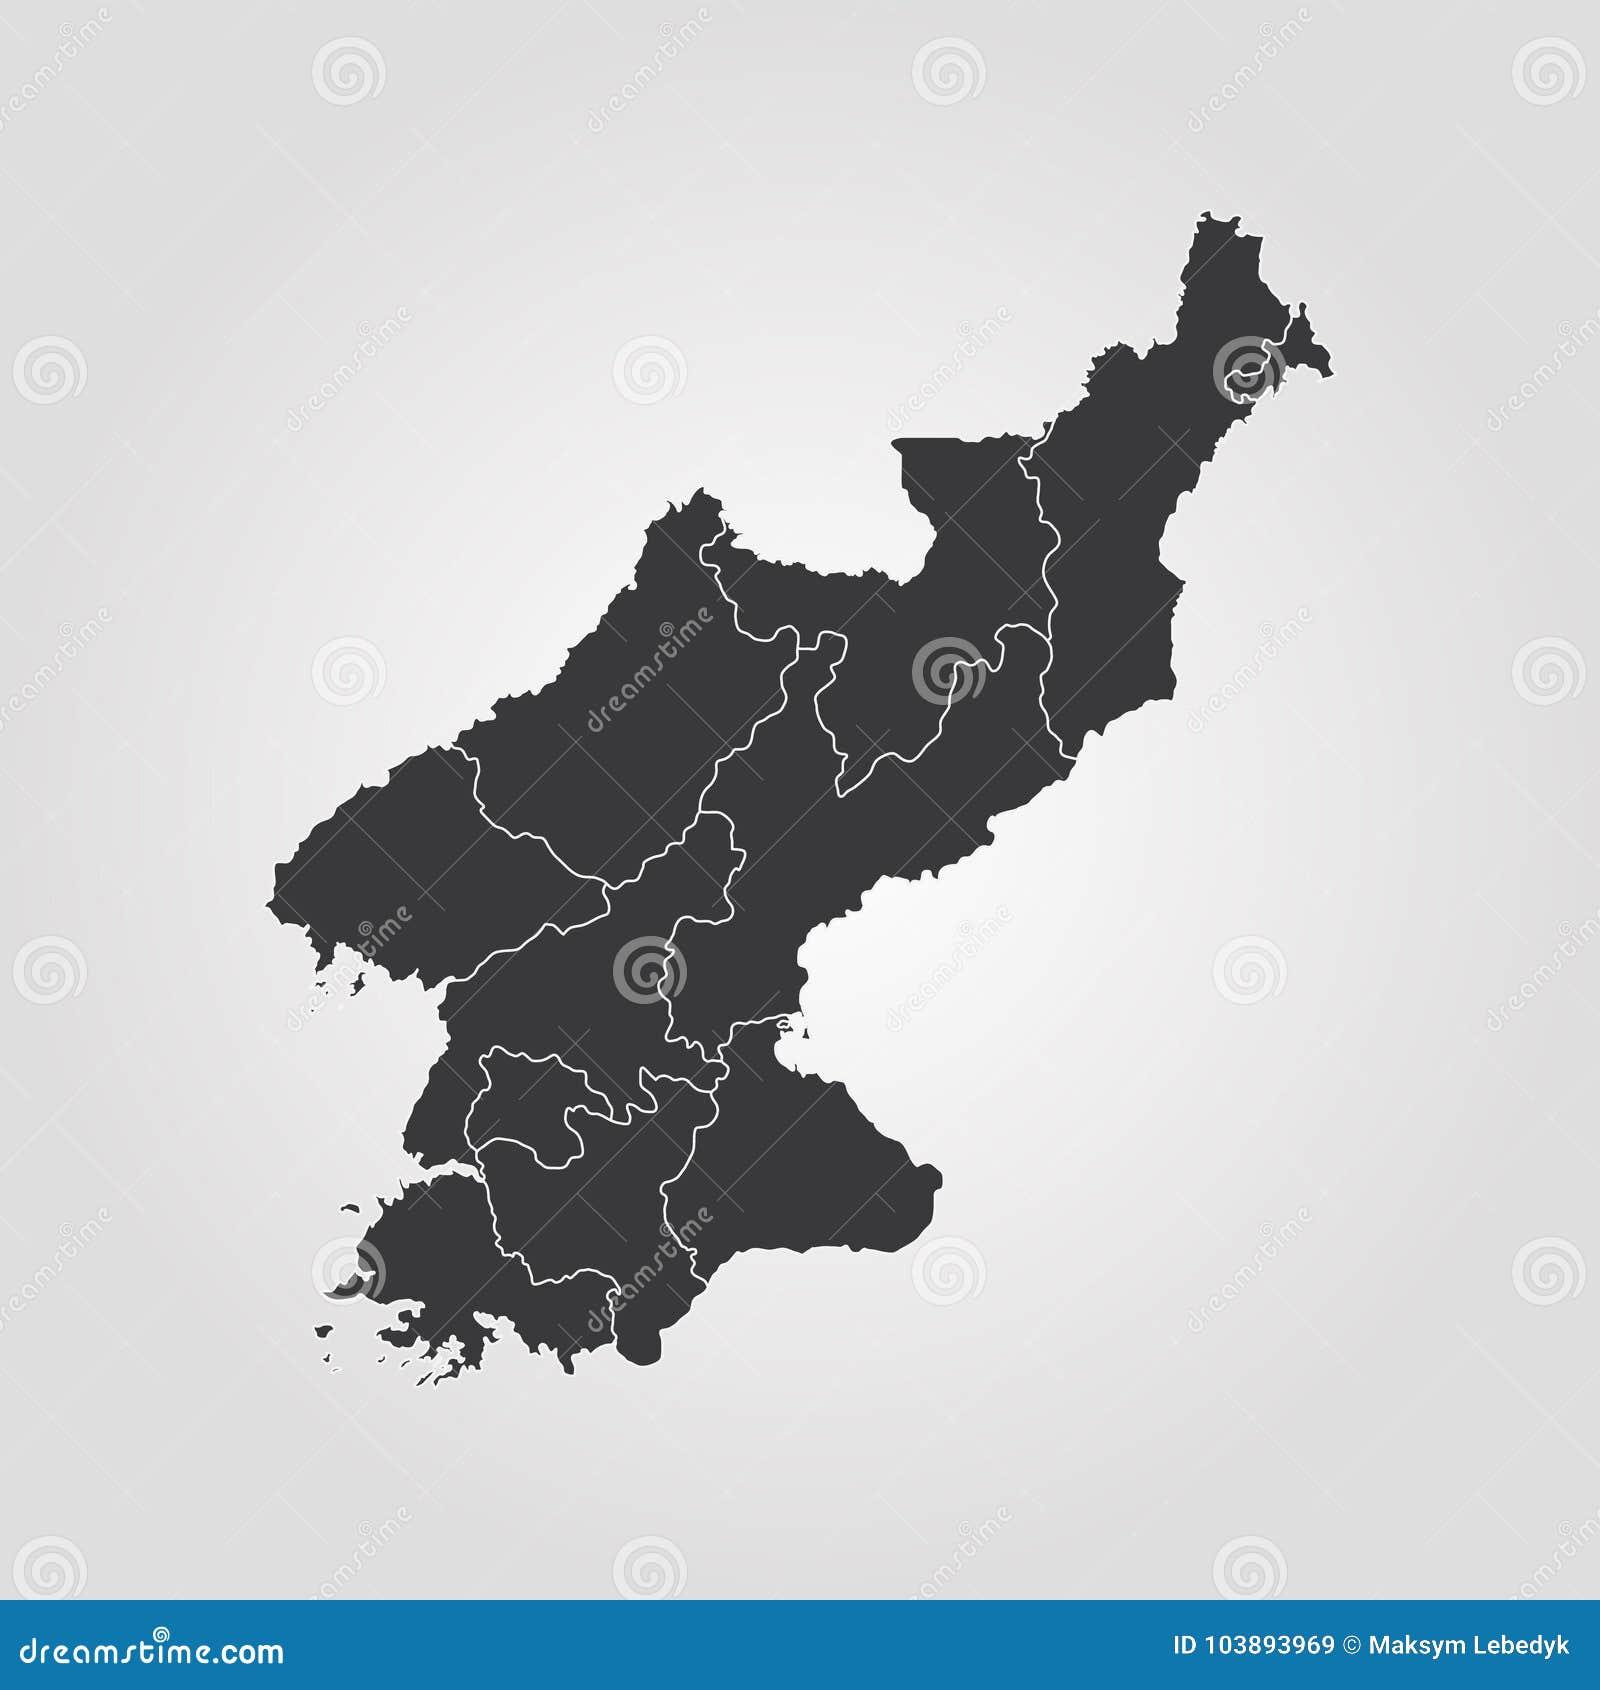 Map of North Korea stock illustration. Illustration of continent ...